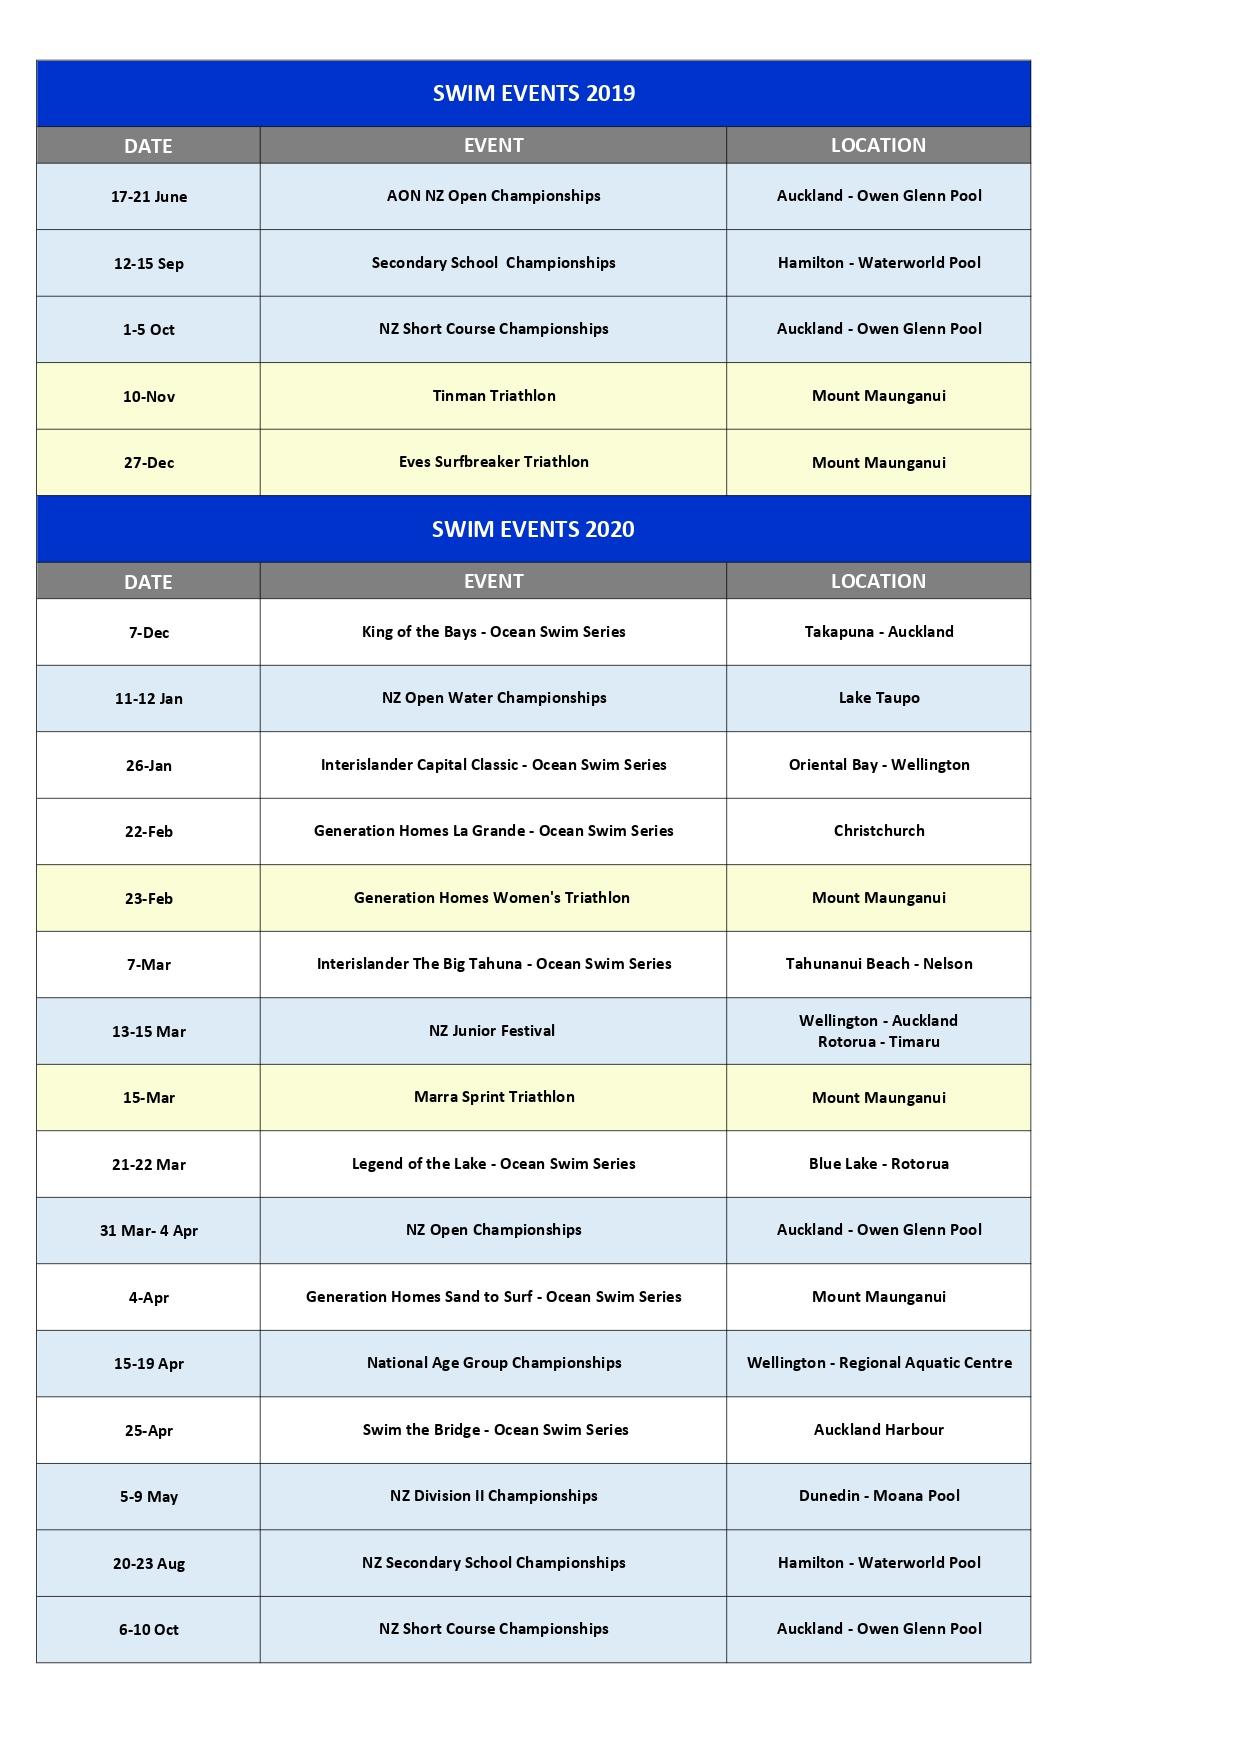 event-calendar-2019-20-page-0001.jpg